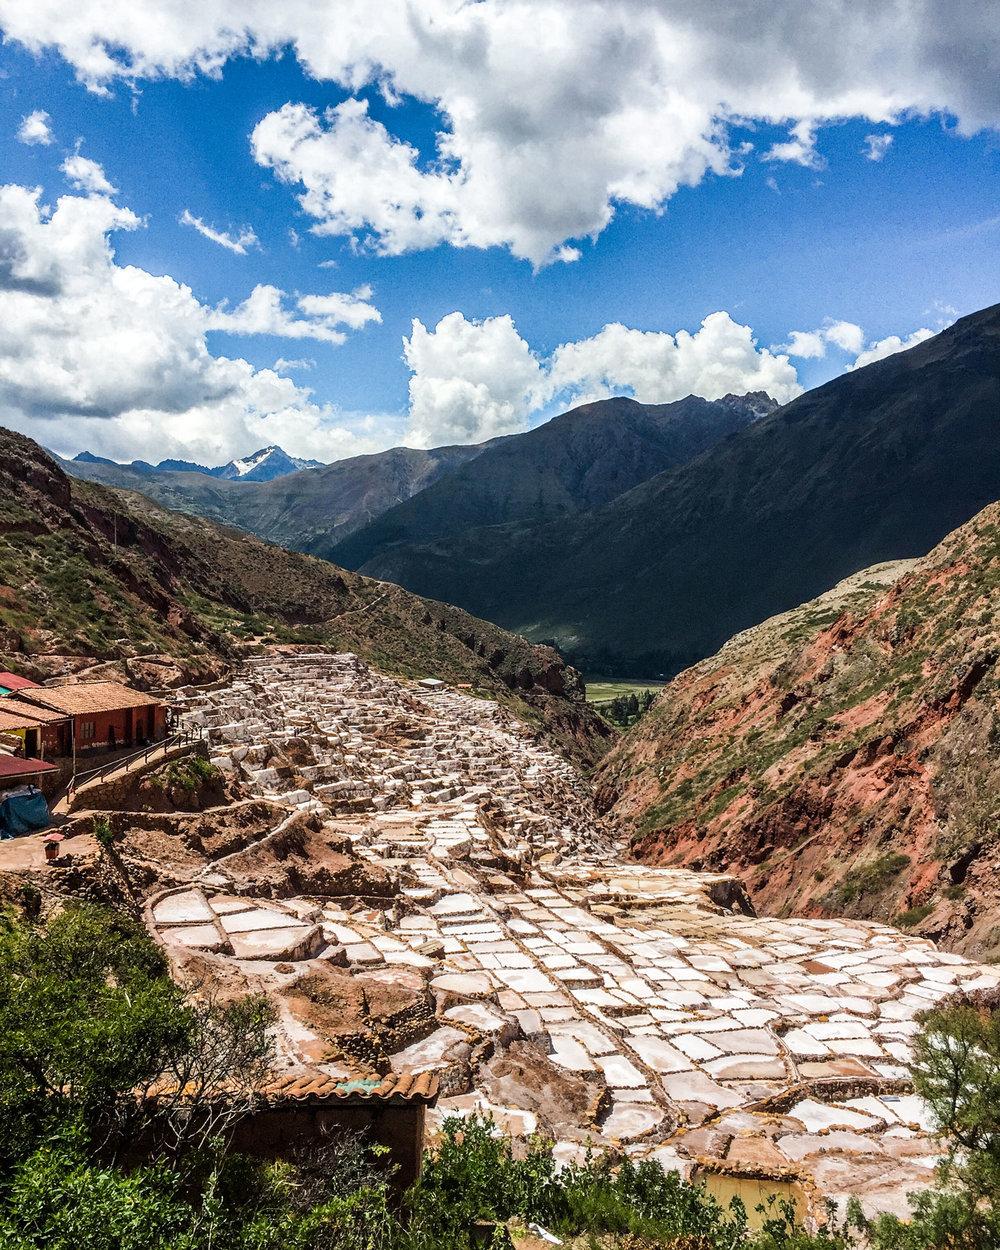 Moras-salt-mines-sacred-valley-peru-wander-south.jpg